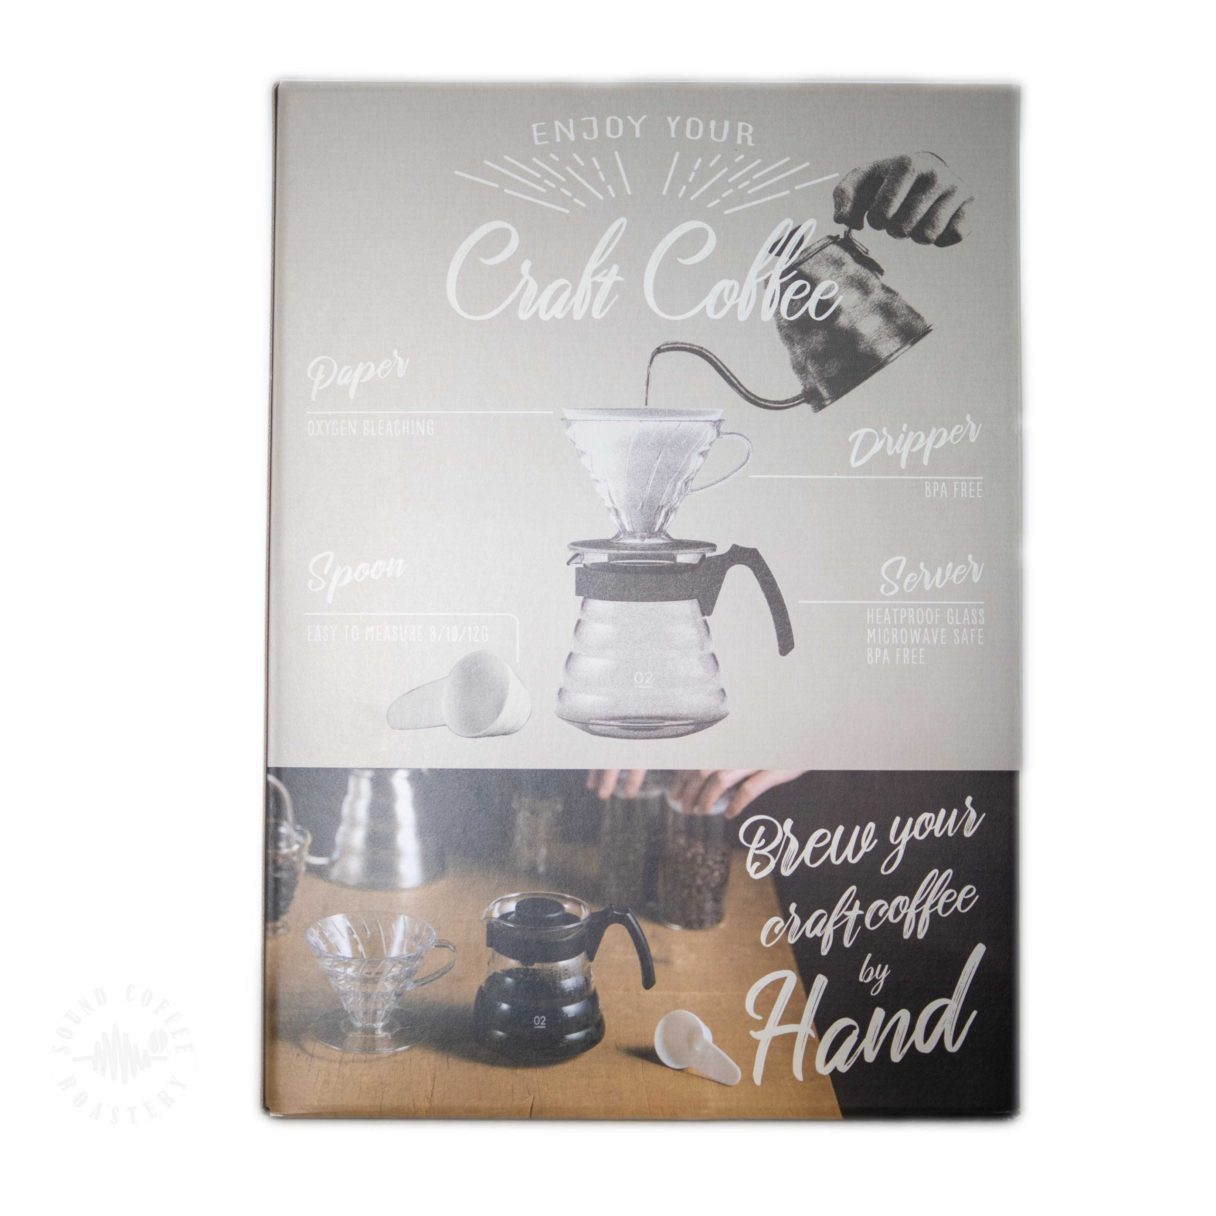 hario v60 craft coffee maker kit